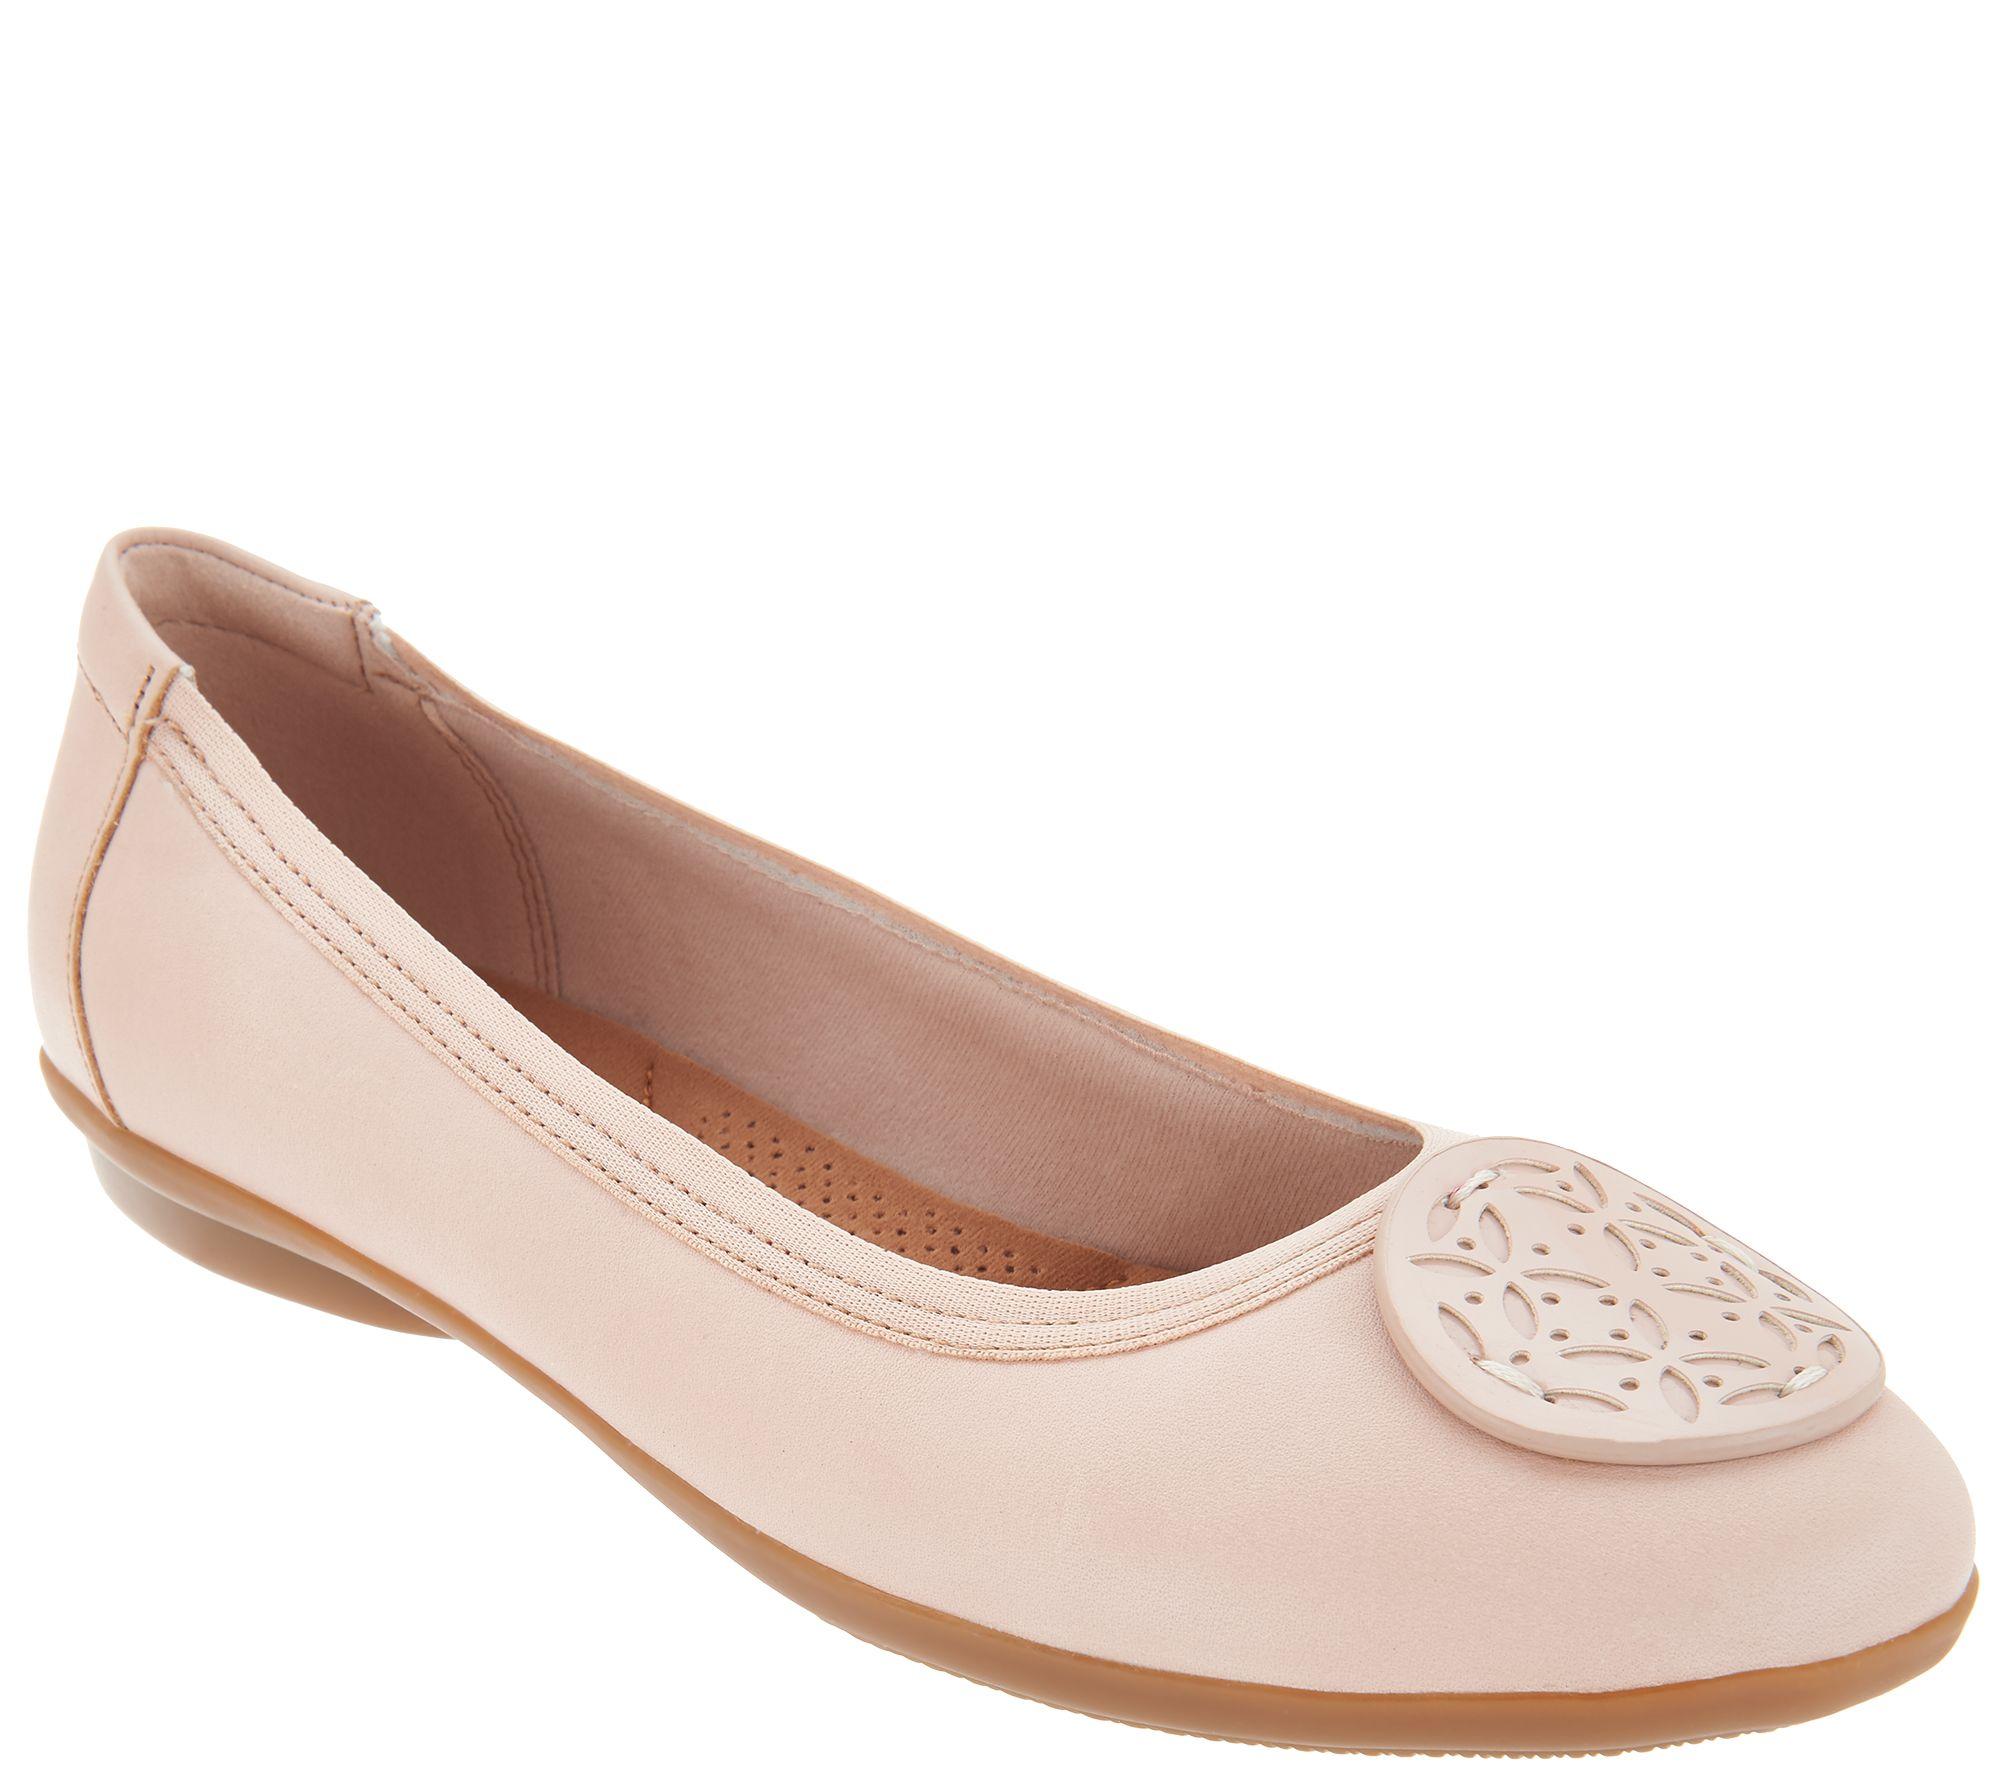 273e688b9da7 Clarks Leather Medallion Comfort Ballet Flats - Gracelin Lola - Page 1 —  QVC.com